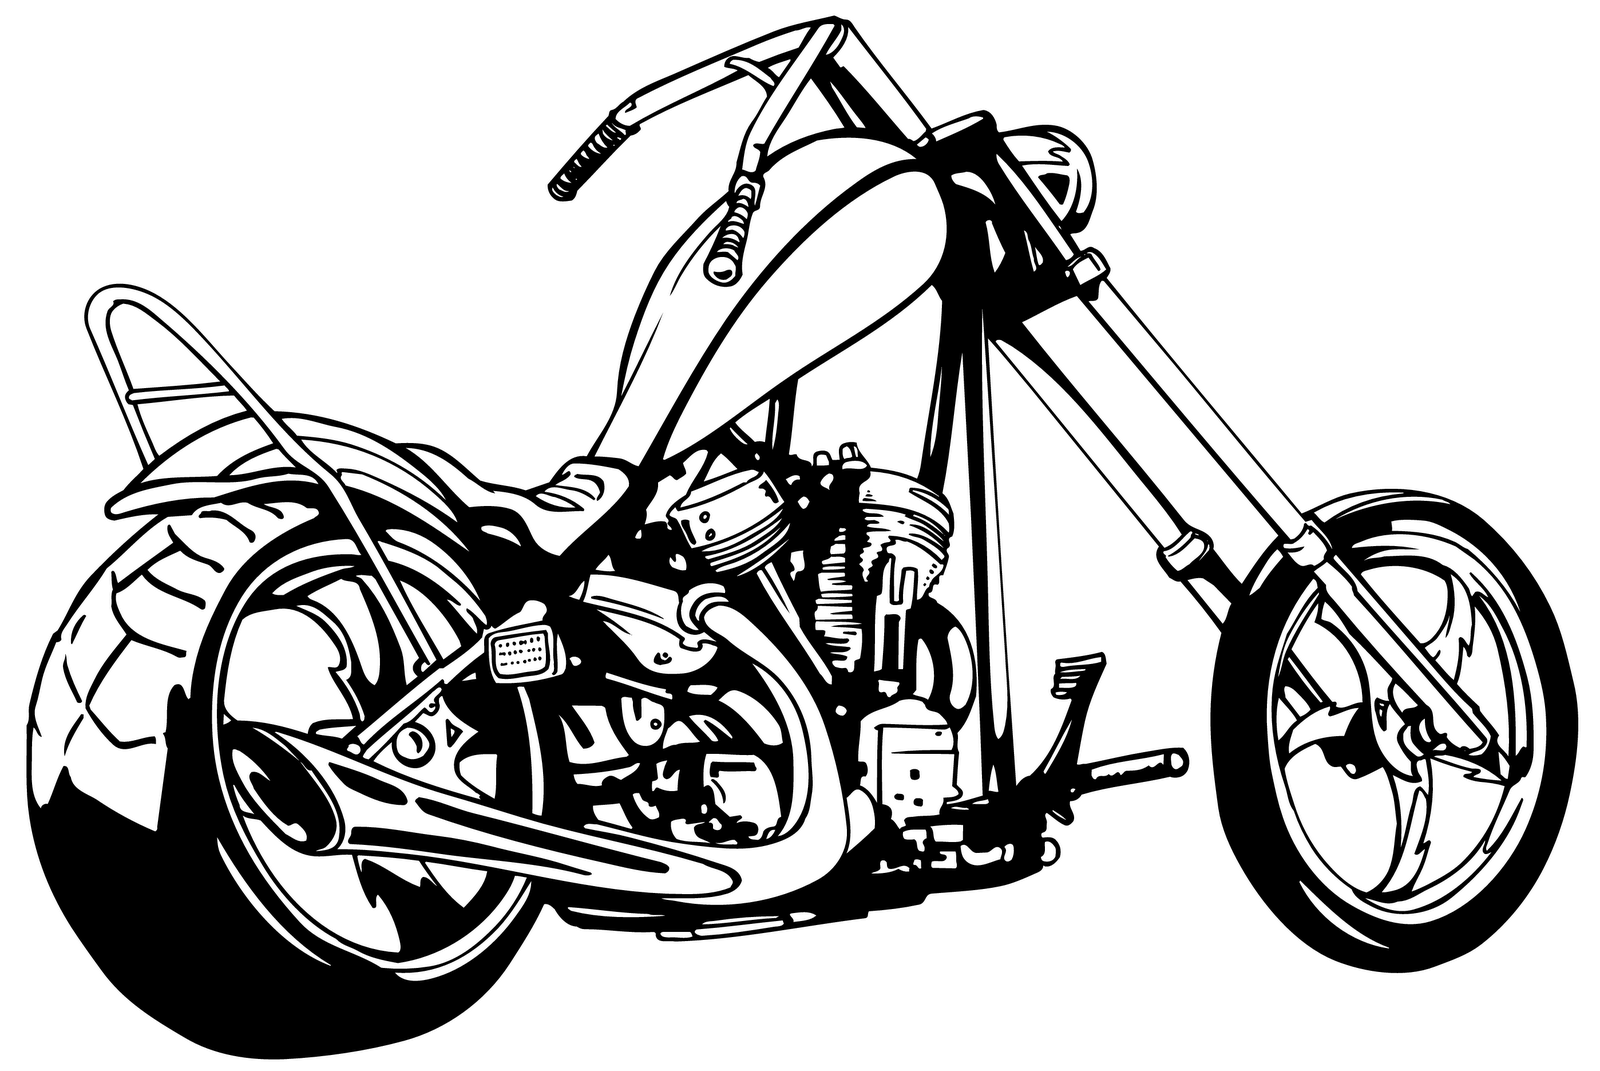 Harley Davidson Clipart - Cliparts.co